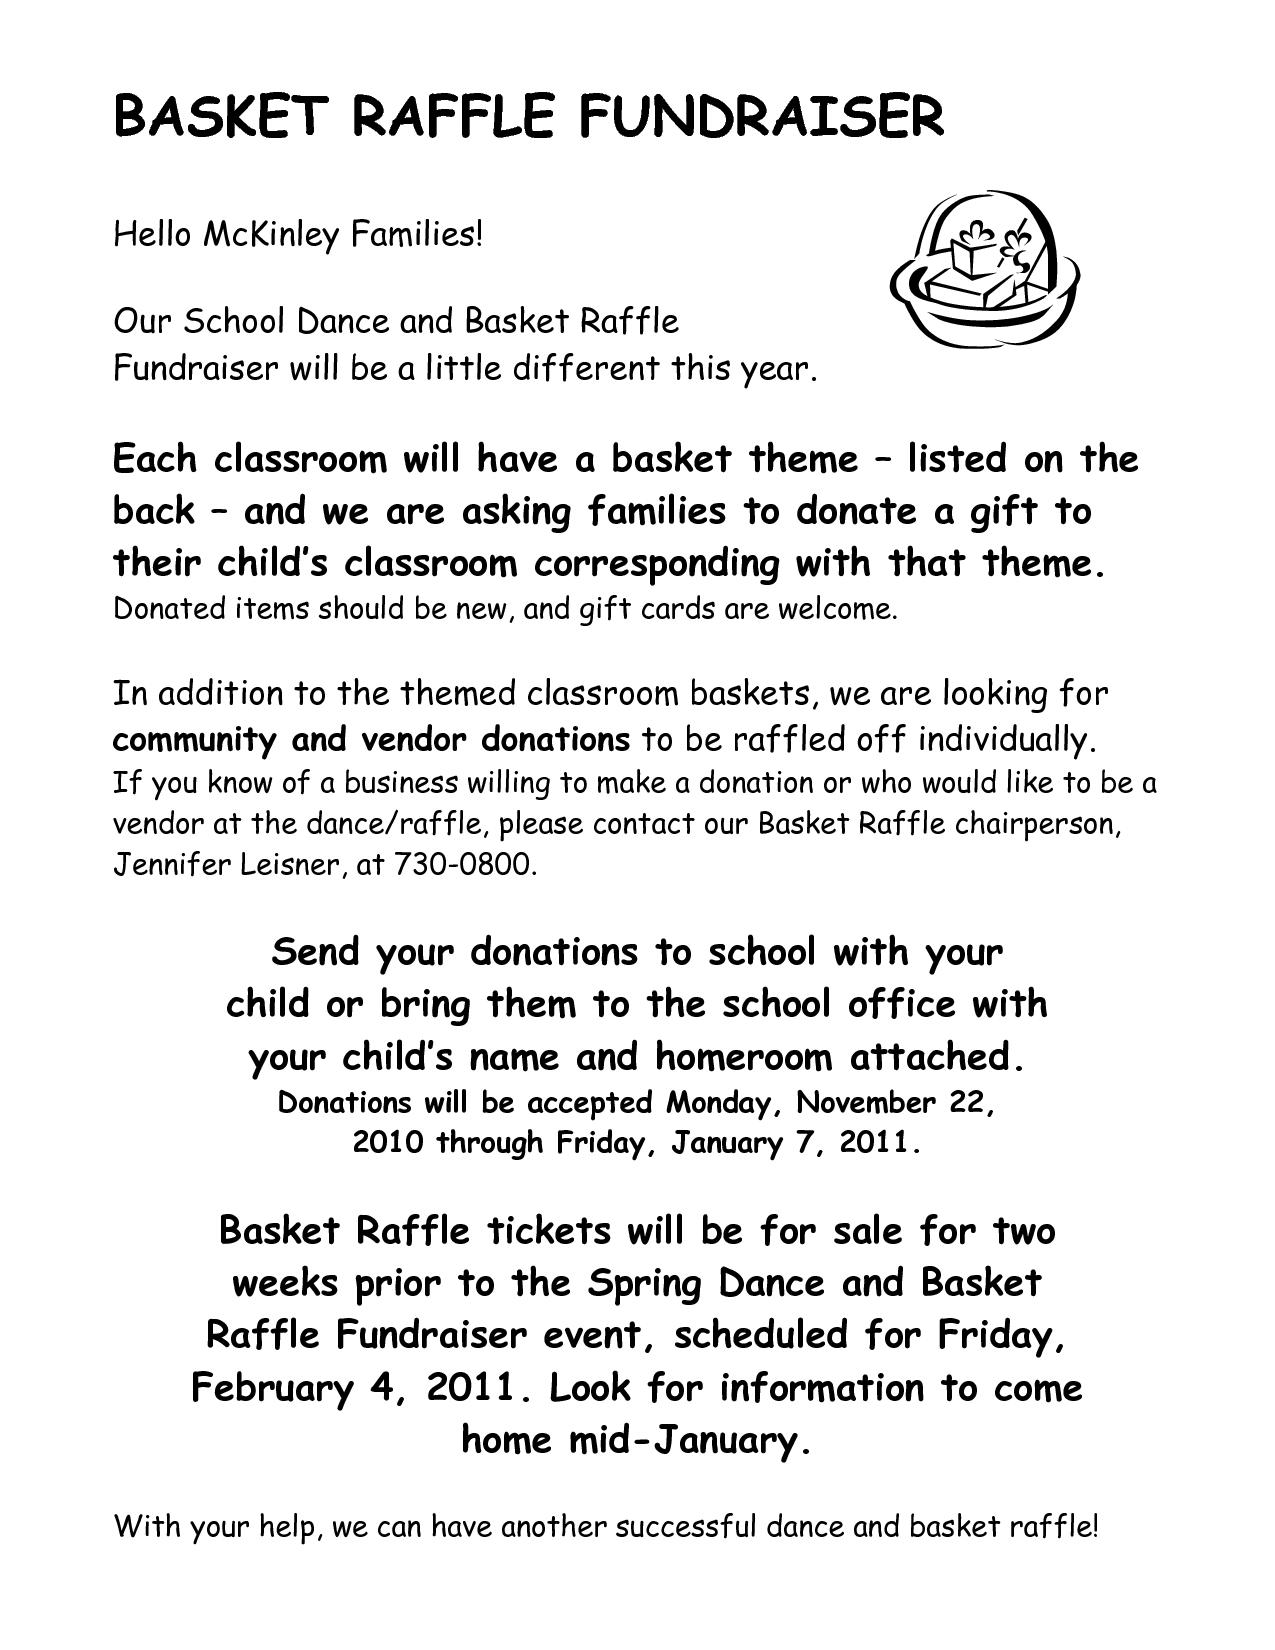 Charity raffle donations idealstalist charity raffle donations spiritdancerdesigns Choice Image